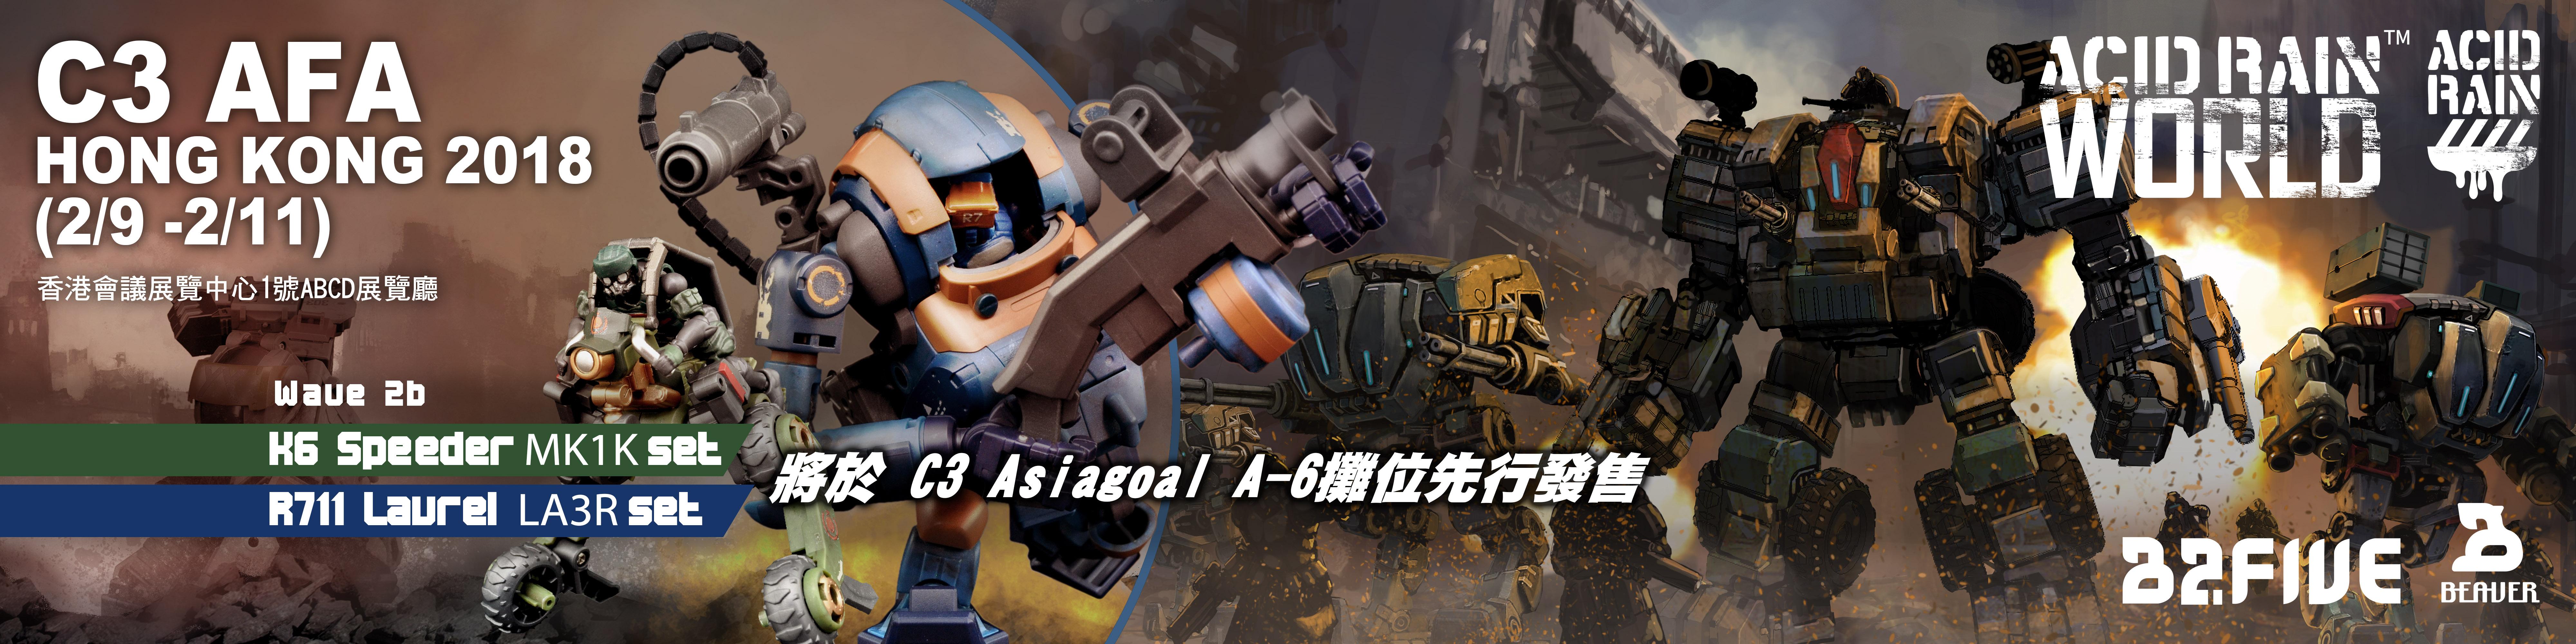 C3-HK-2018_long-copy